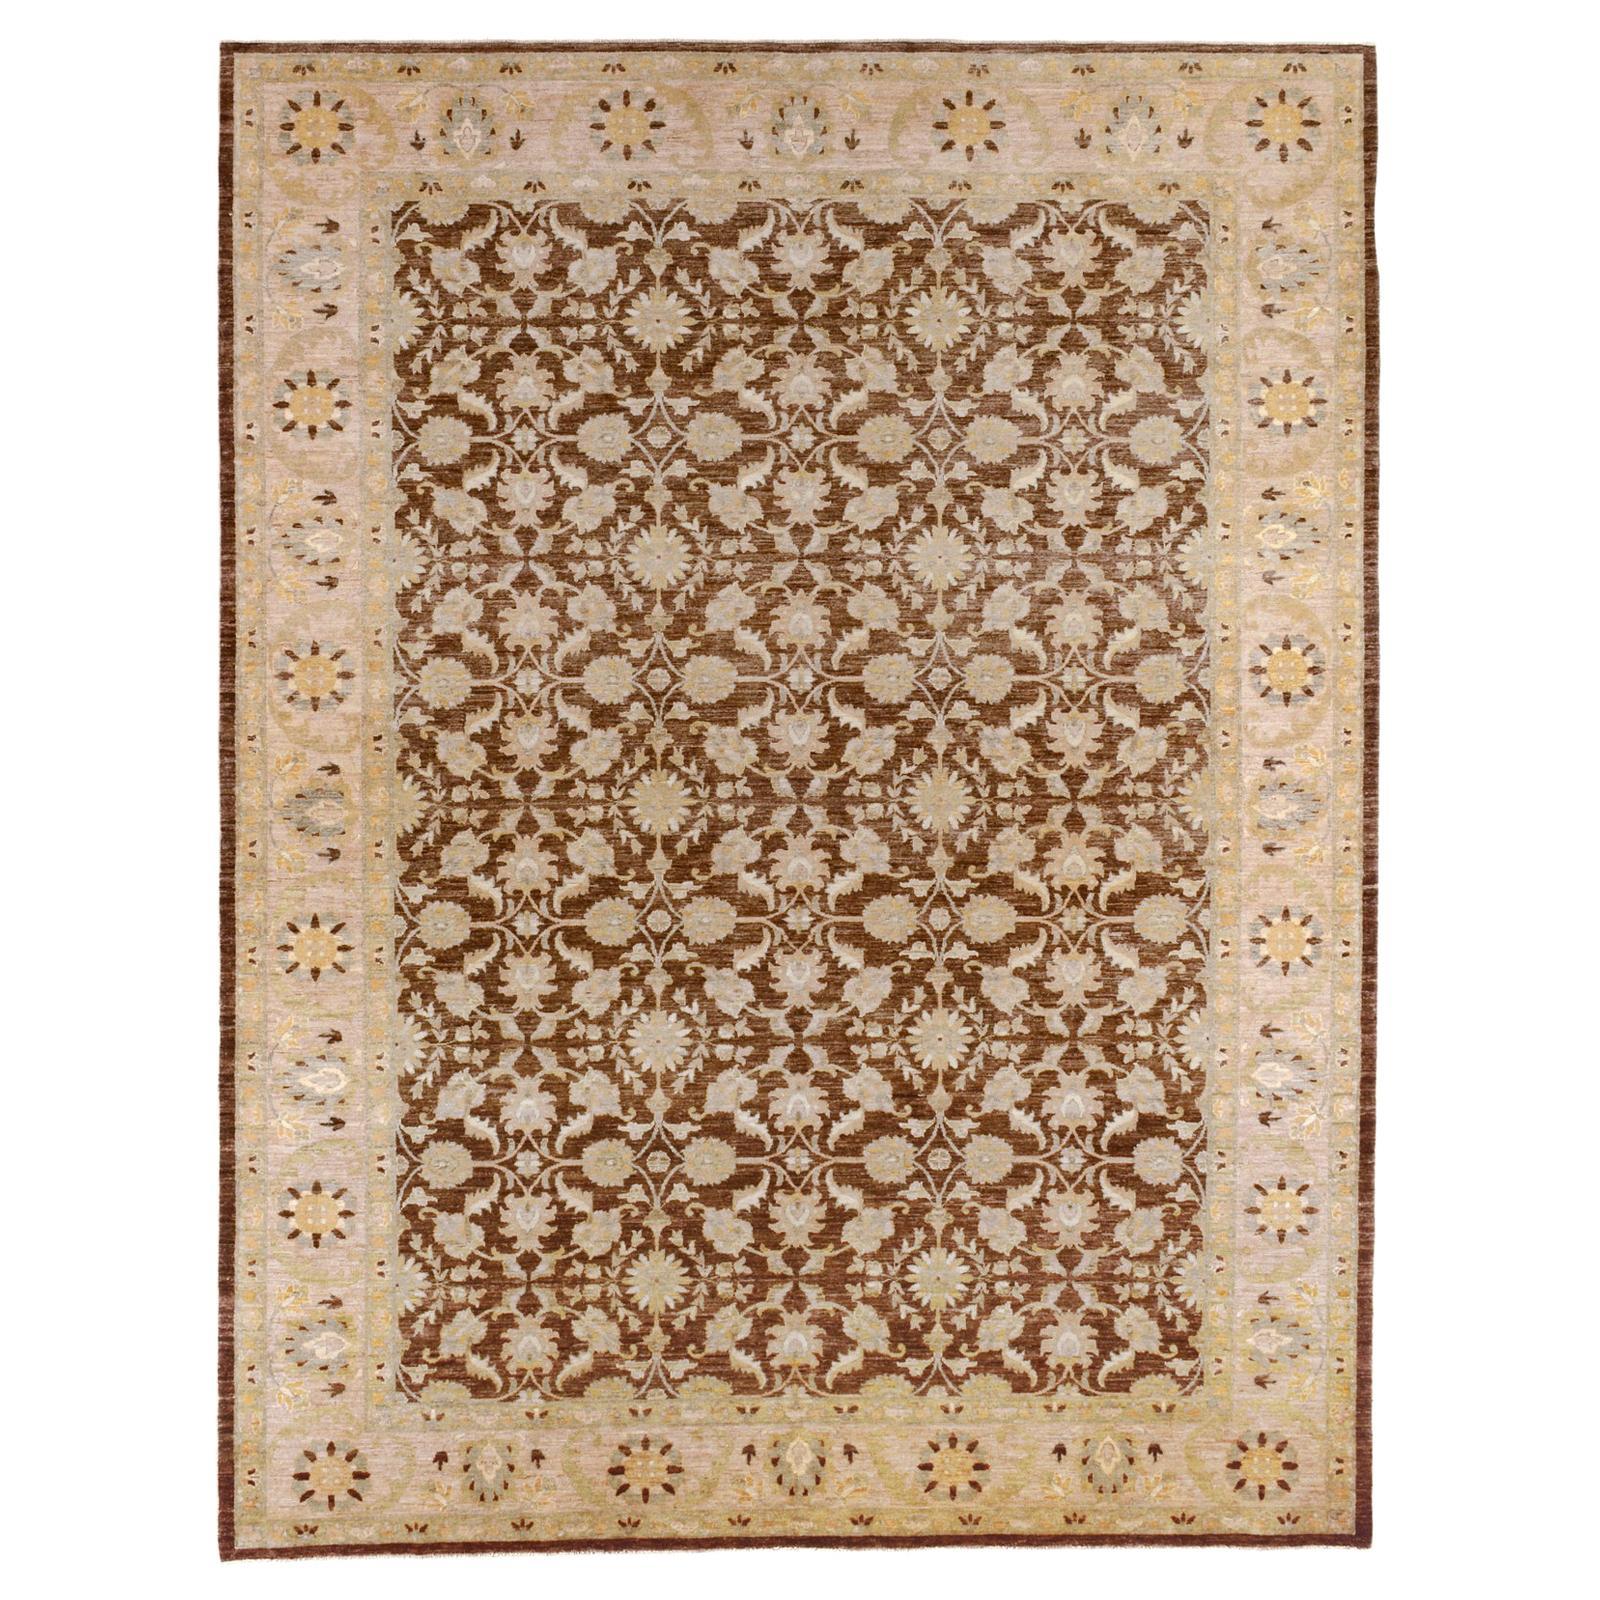 Brown and Beige Floral Wool Area Rug